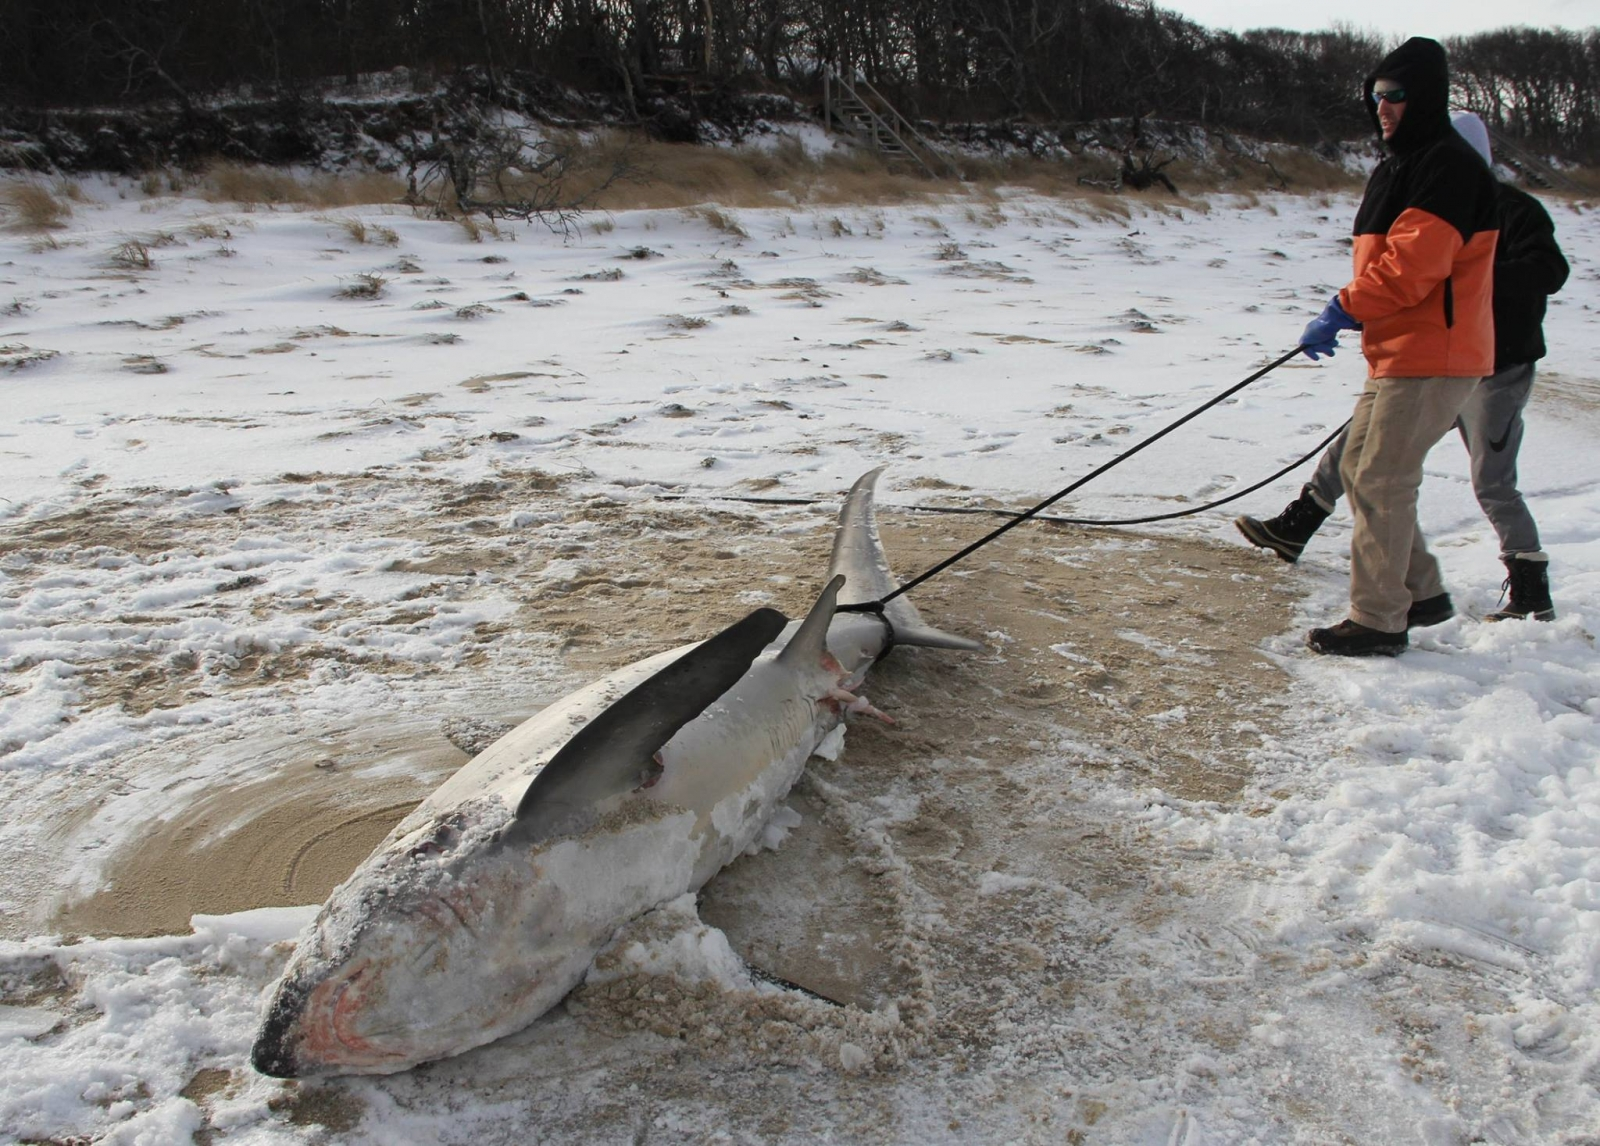 Sharks killed by freezing weather